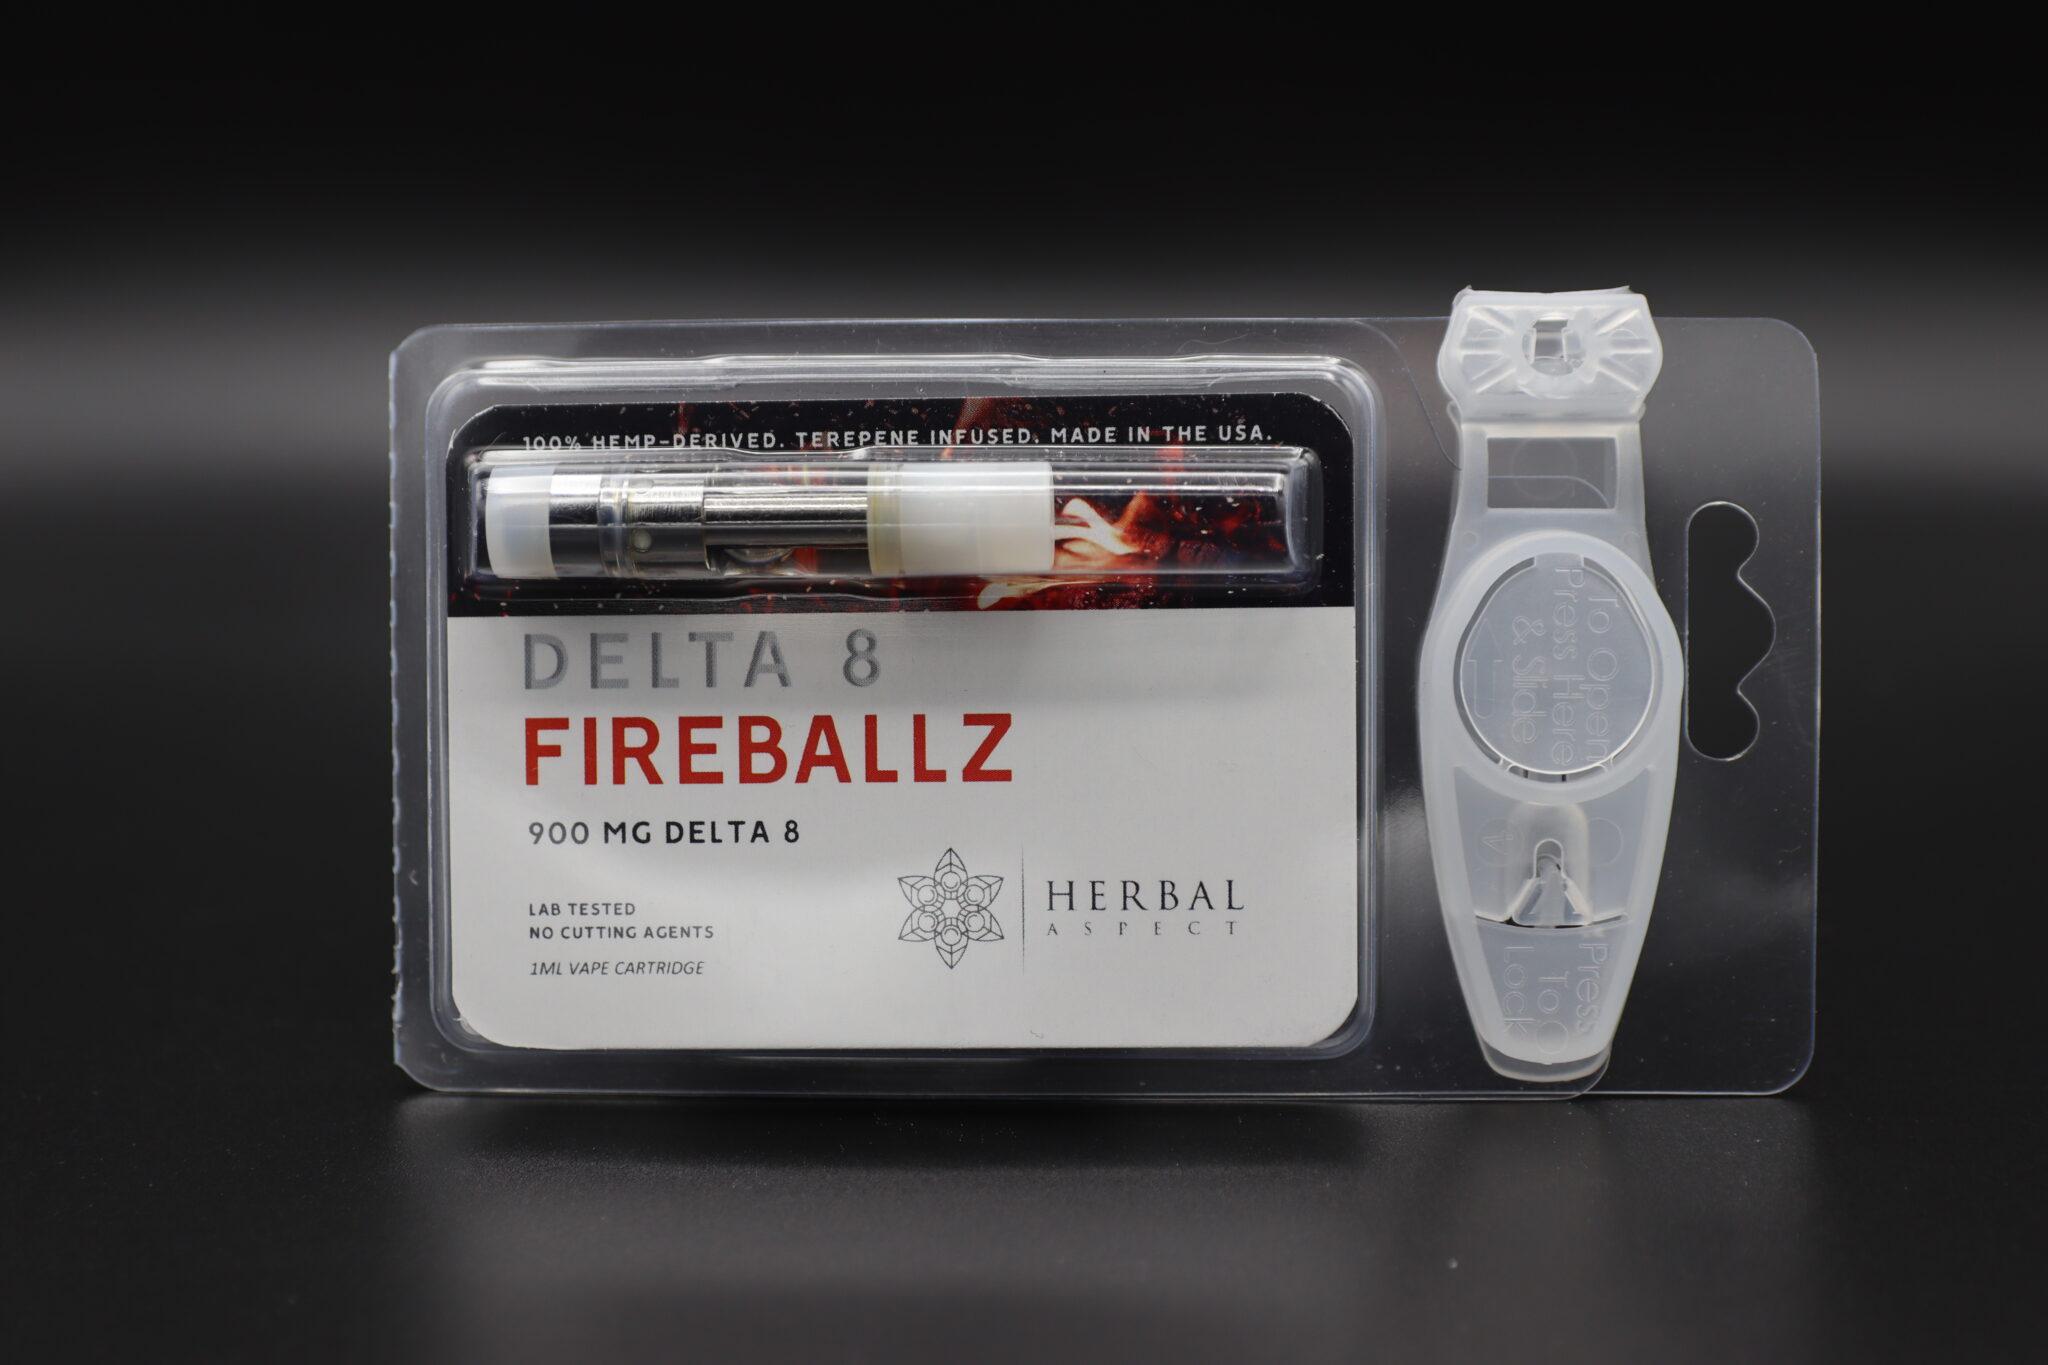 Herbal Aspect Delta 8 Vape - 900 MG -Fireballz